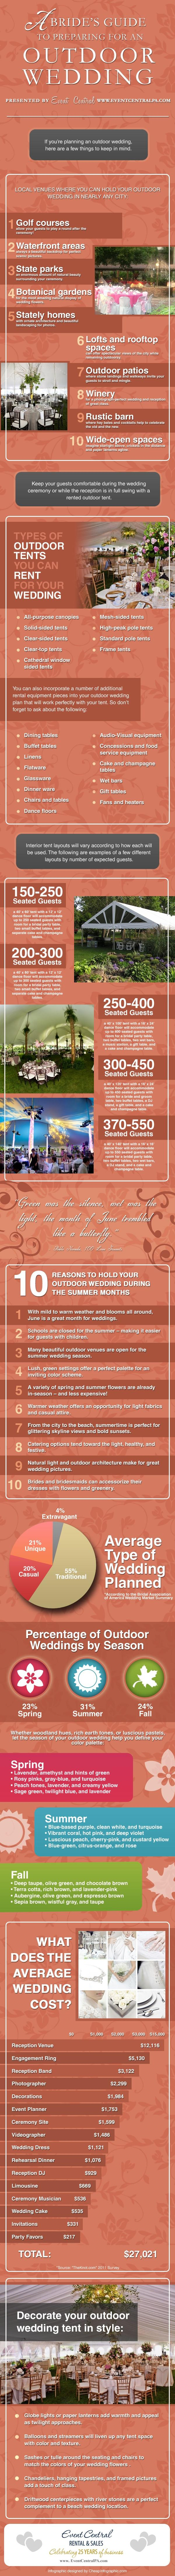 Свадьба - Wedding Tips - Wedding Resource Ideas I Wedding Trends I Wedding Advice